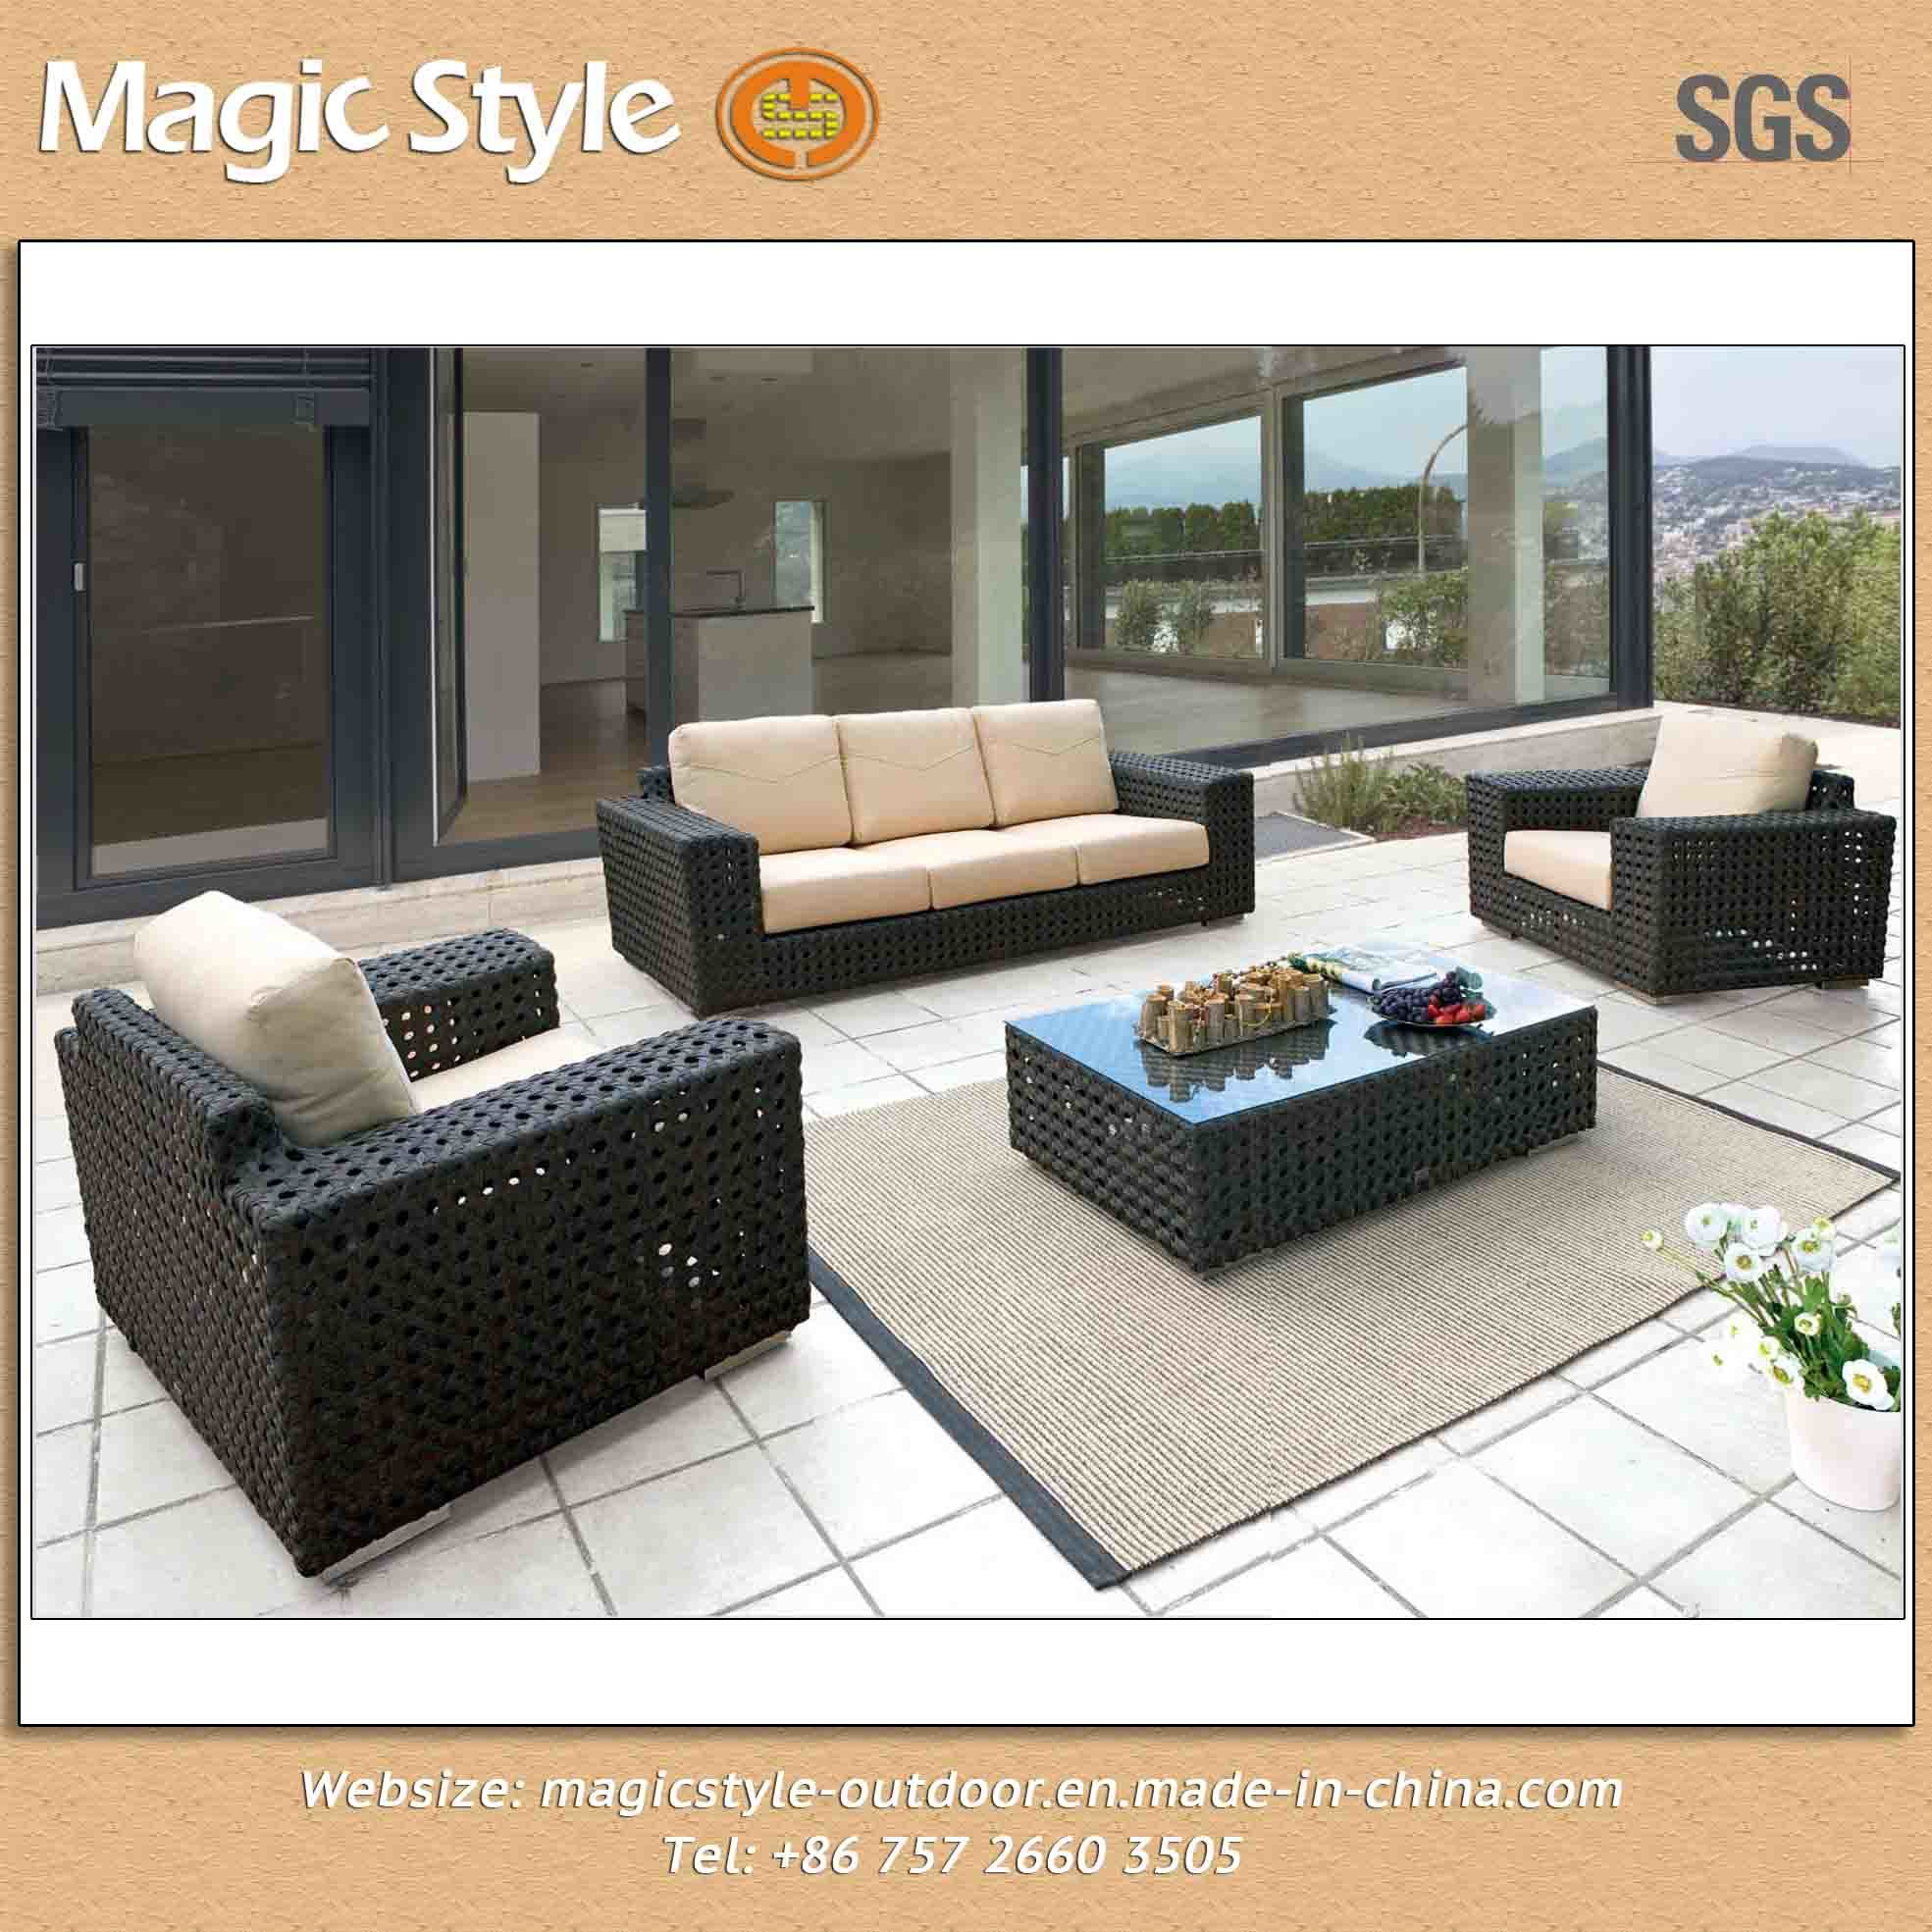 china open weaving sofa outdoor sofa big size sofa hotel